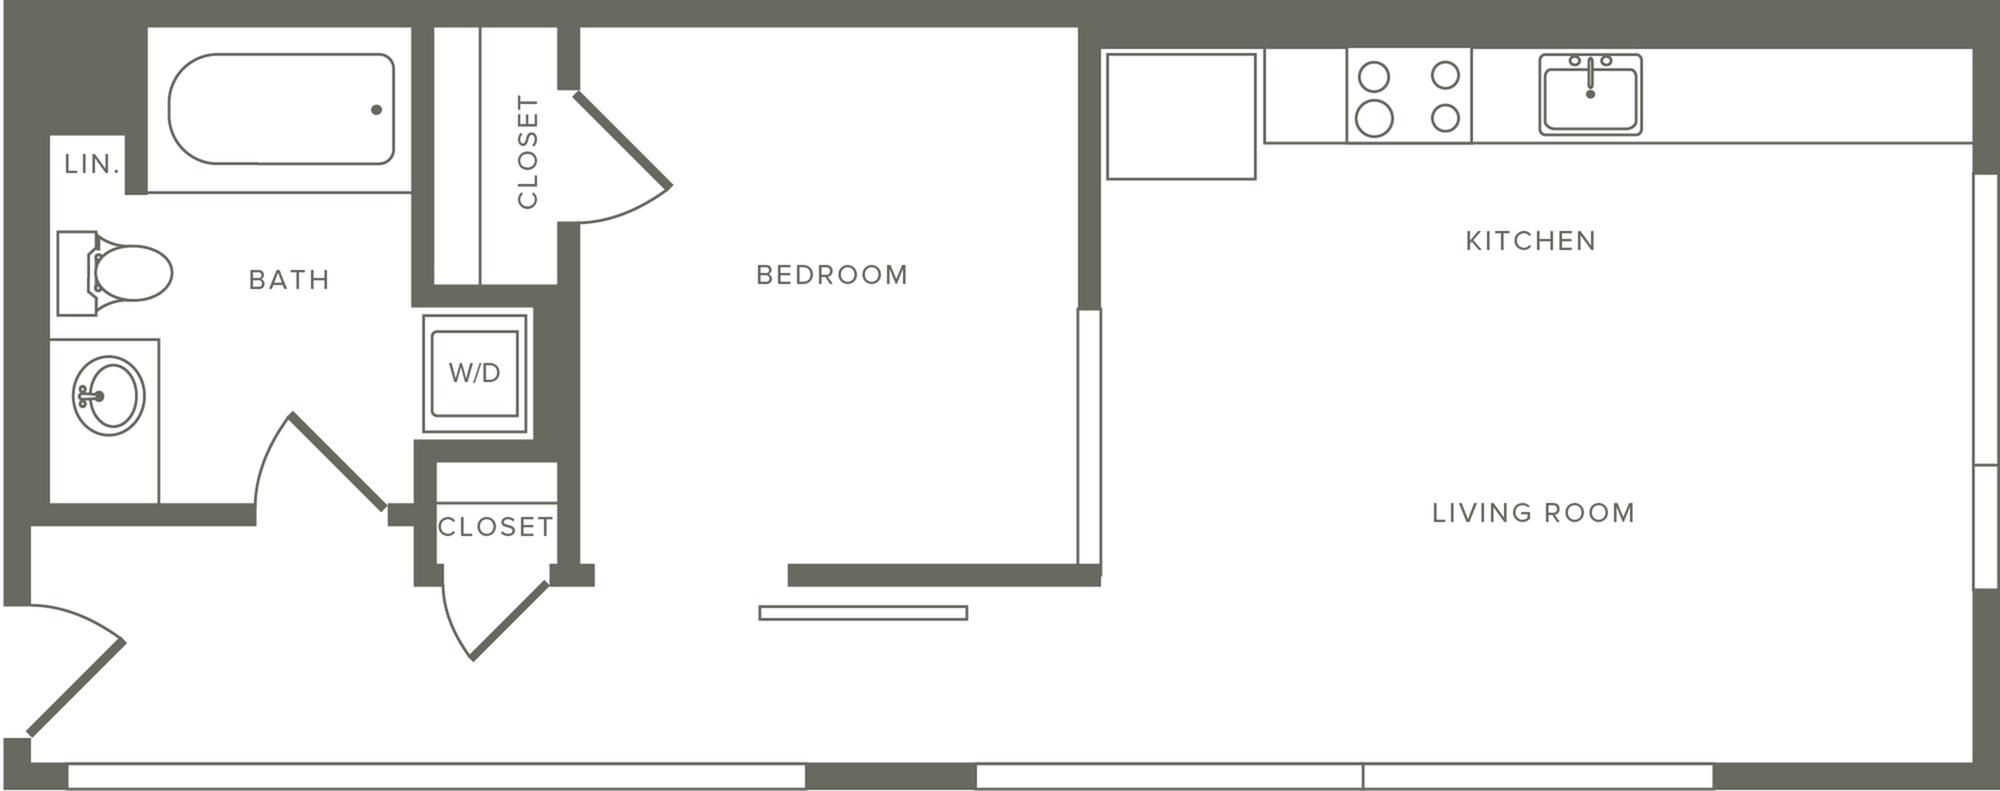 581-637 square foot one bedroom one bath floor plan image